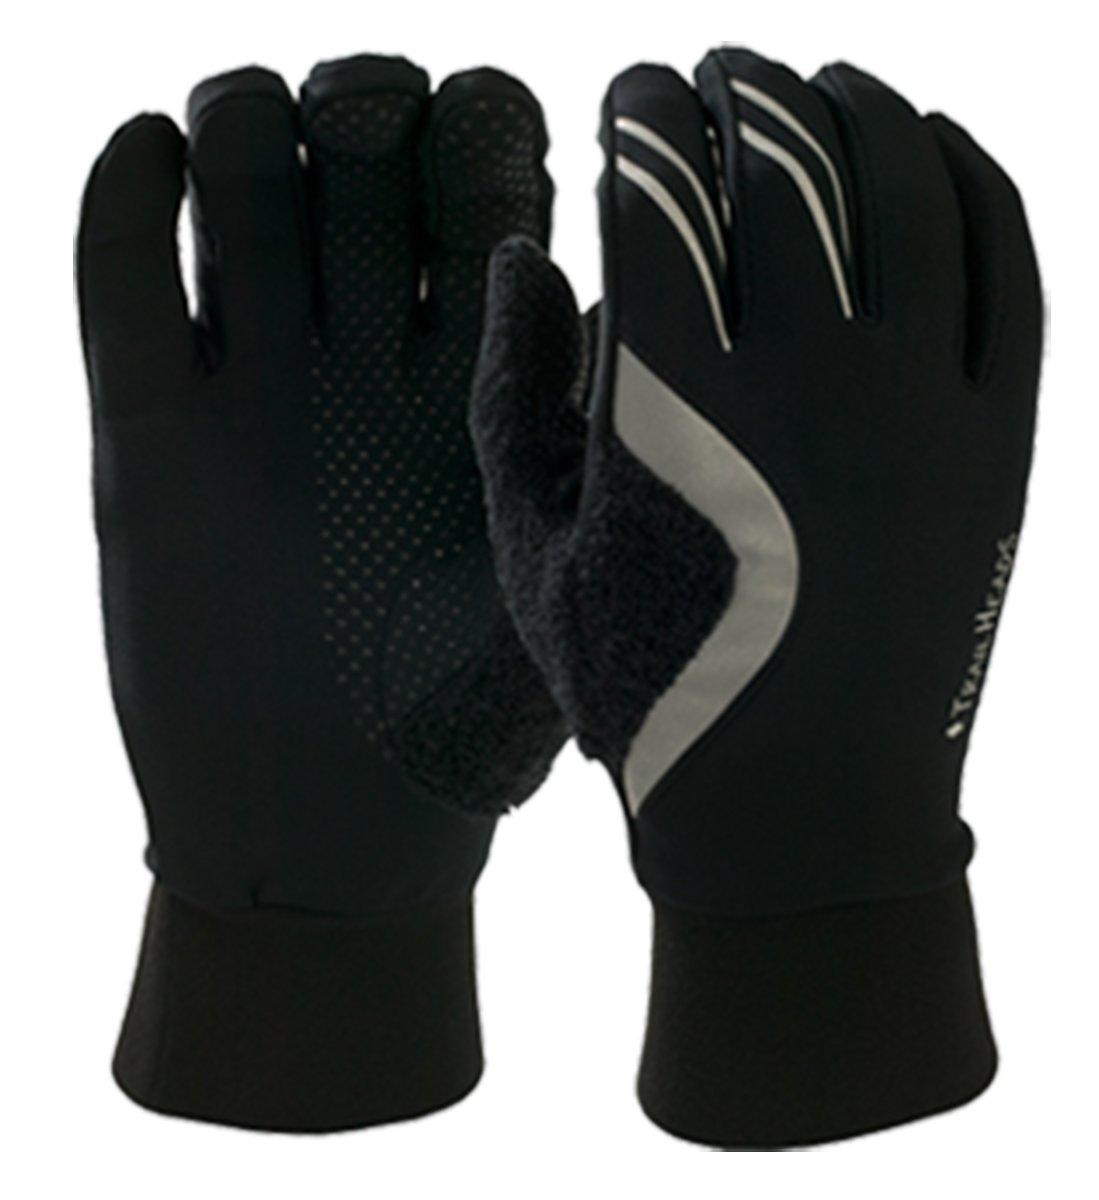 TrailHeads HyperReflect Running Gloves